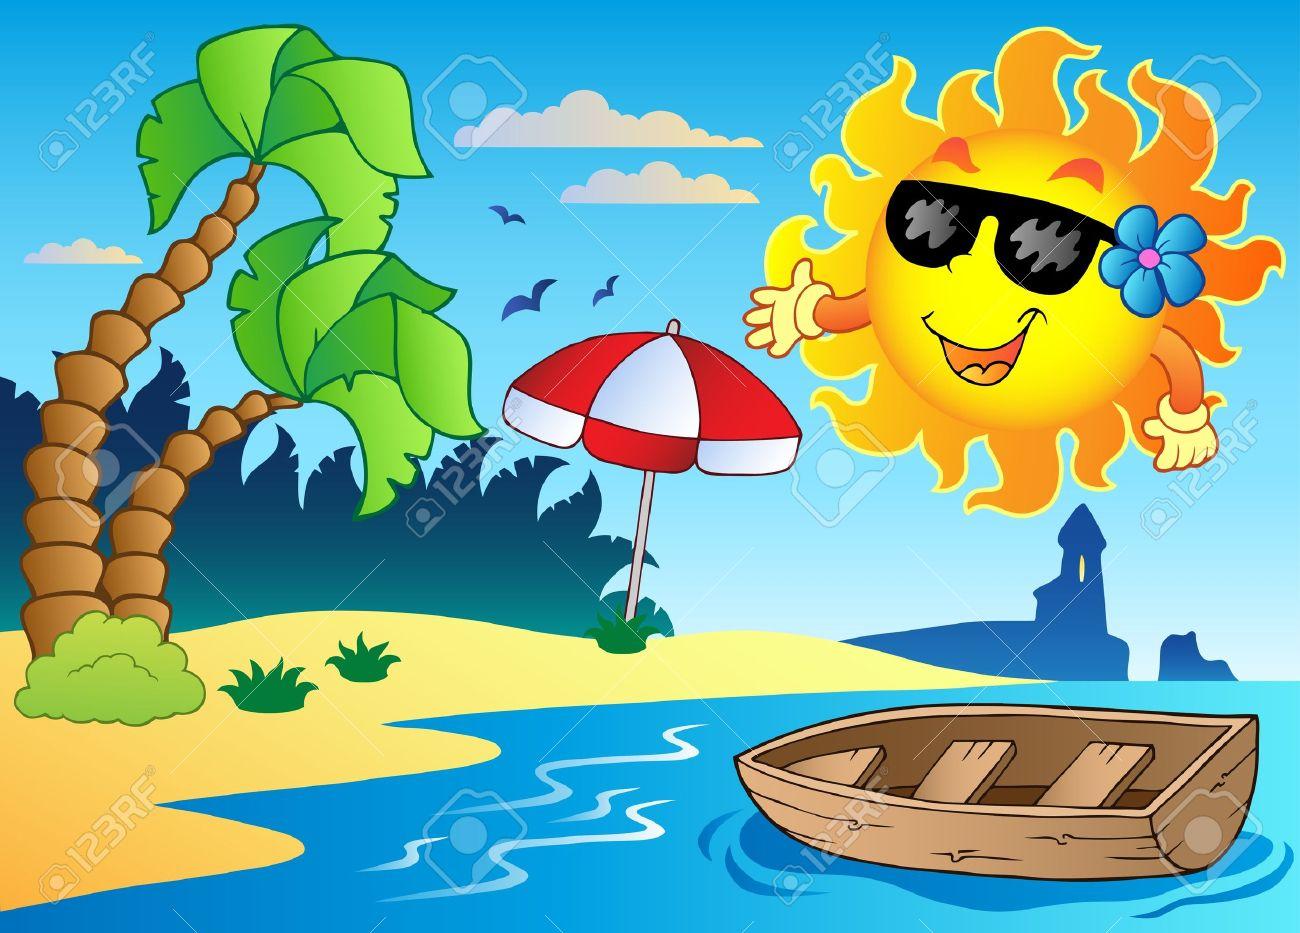 Summer season clipart.